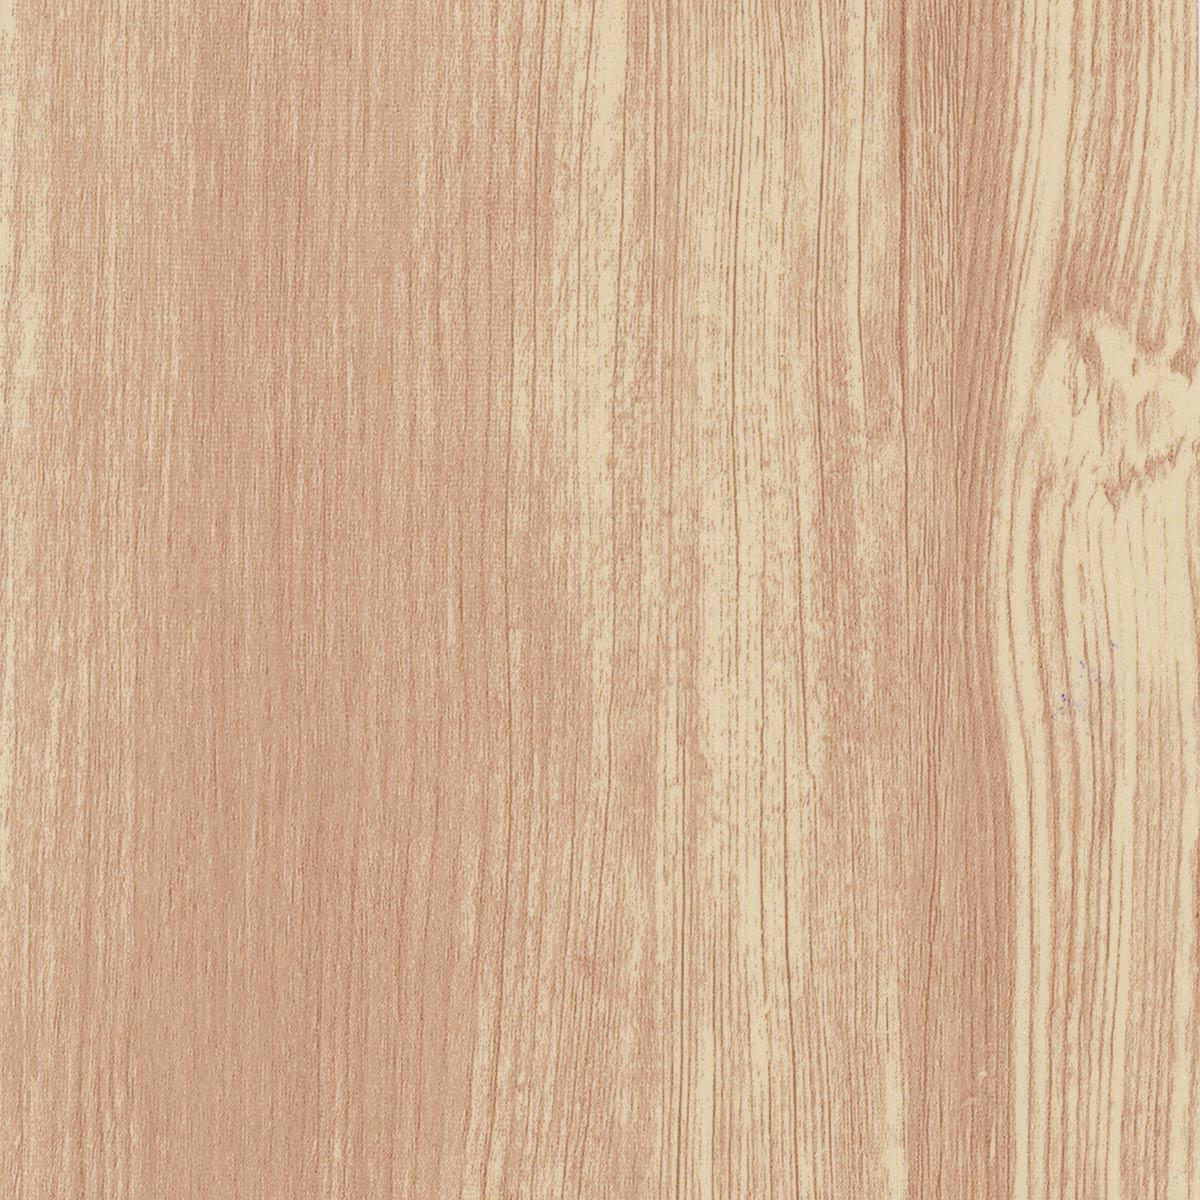 Coated panel PVC code PS-128015